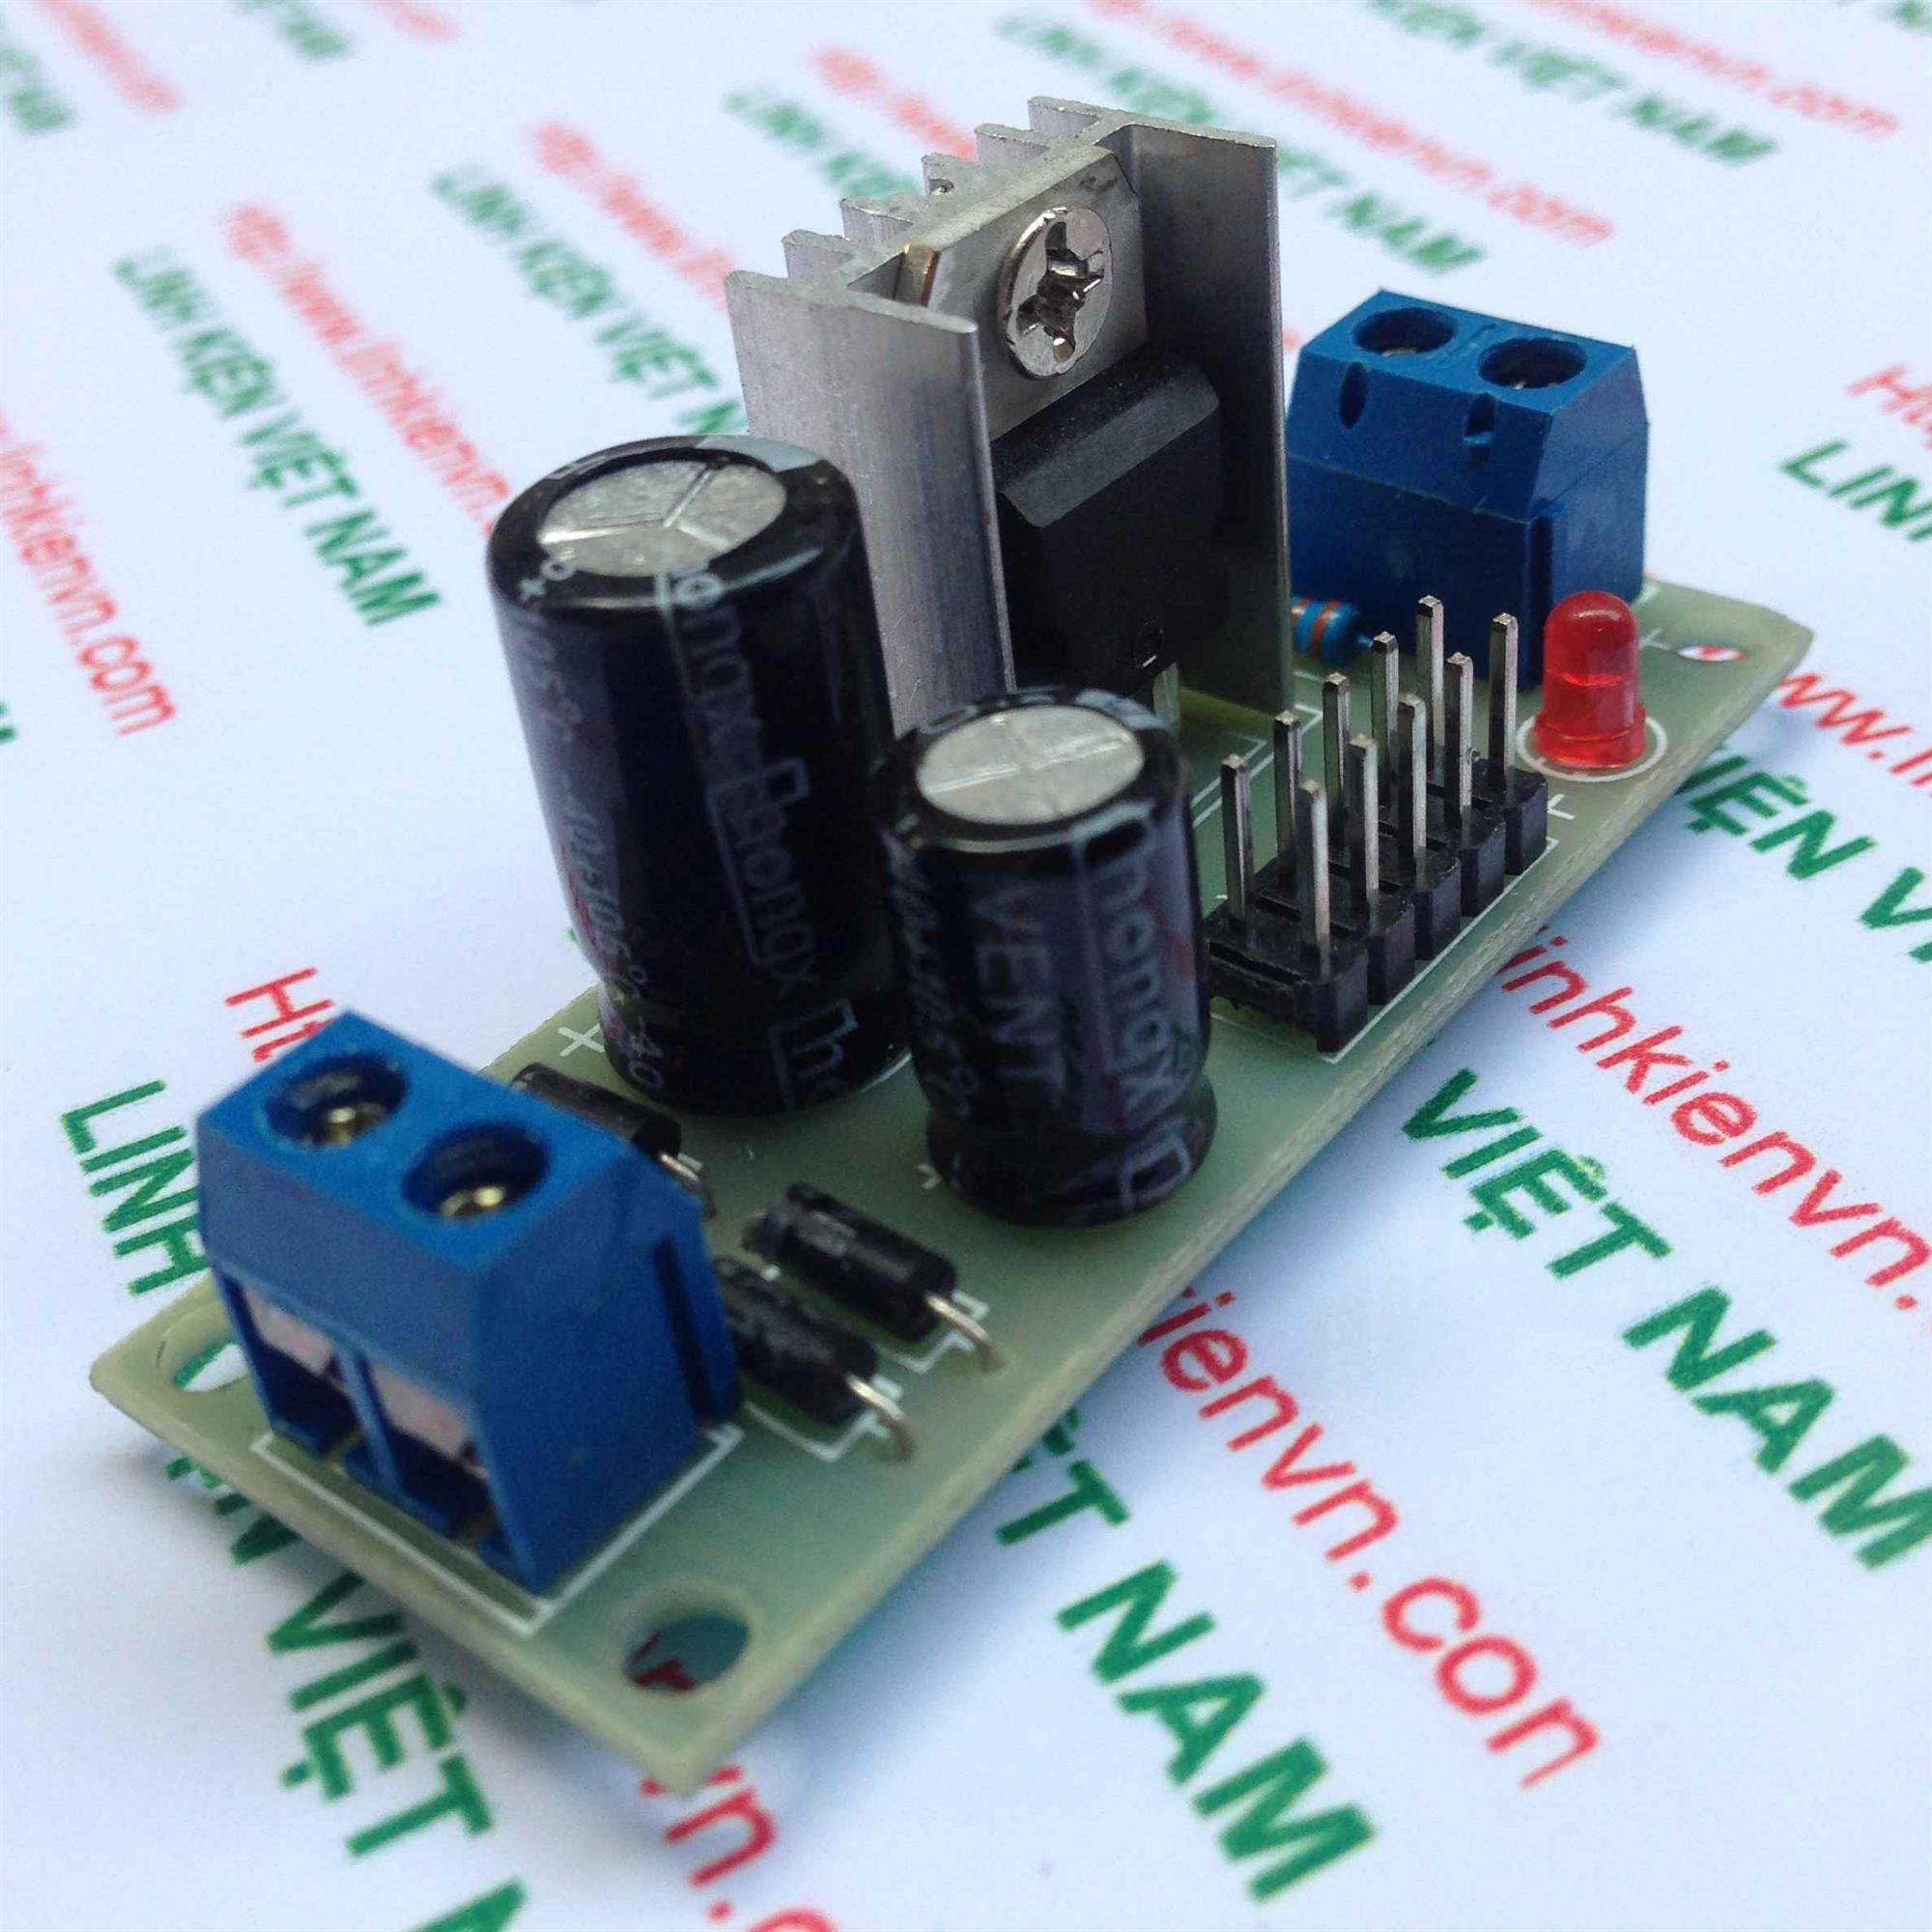 Module nguồn ổn áp 5V / Module nguồn 7805 / Module nguồn DC - S4H5